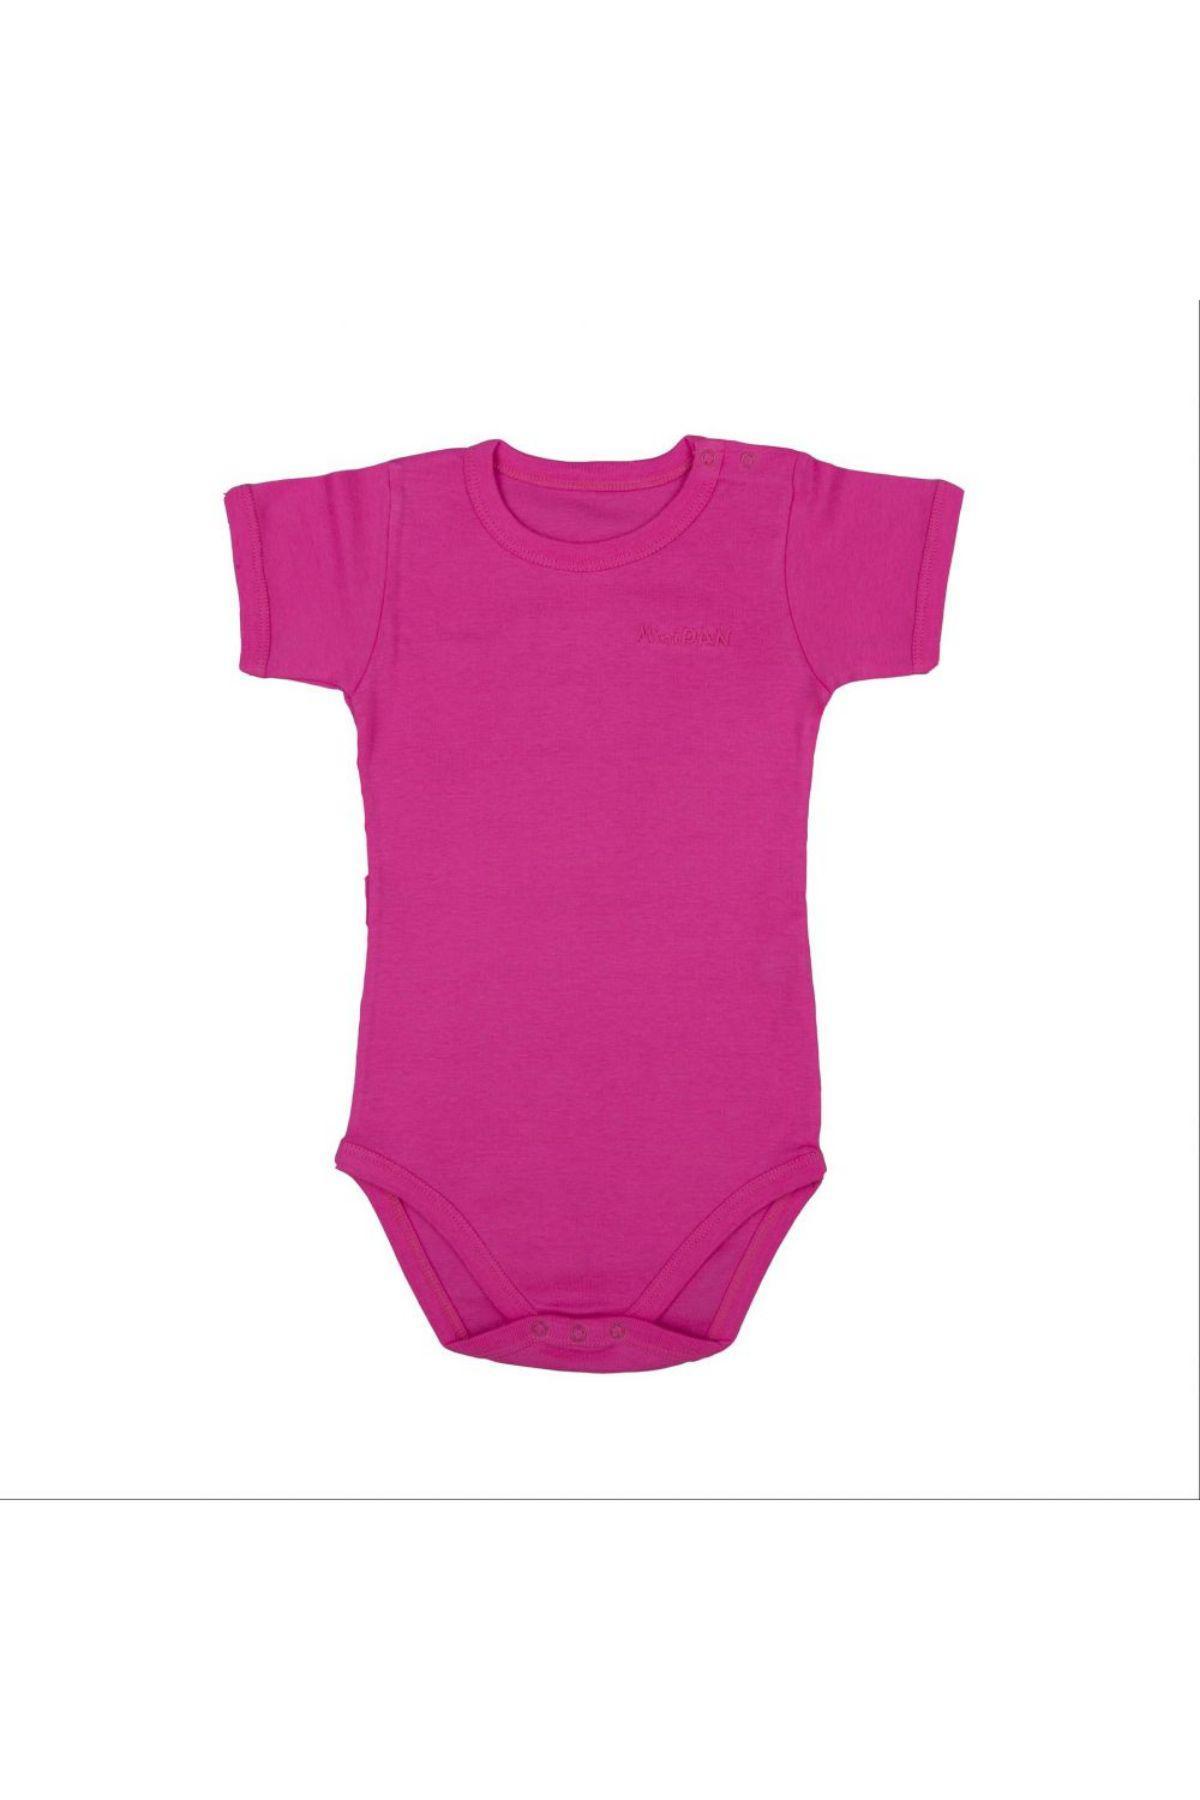 Bebepan 5014 ФУКСИЯ Боди для младенцев